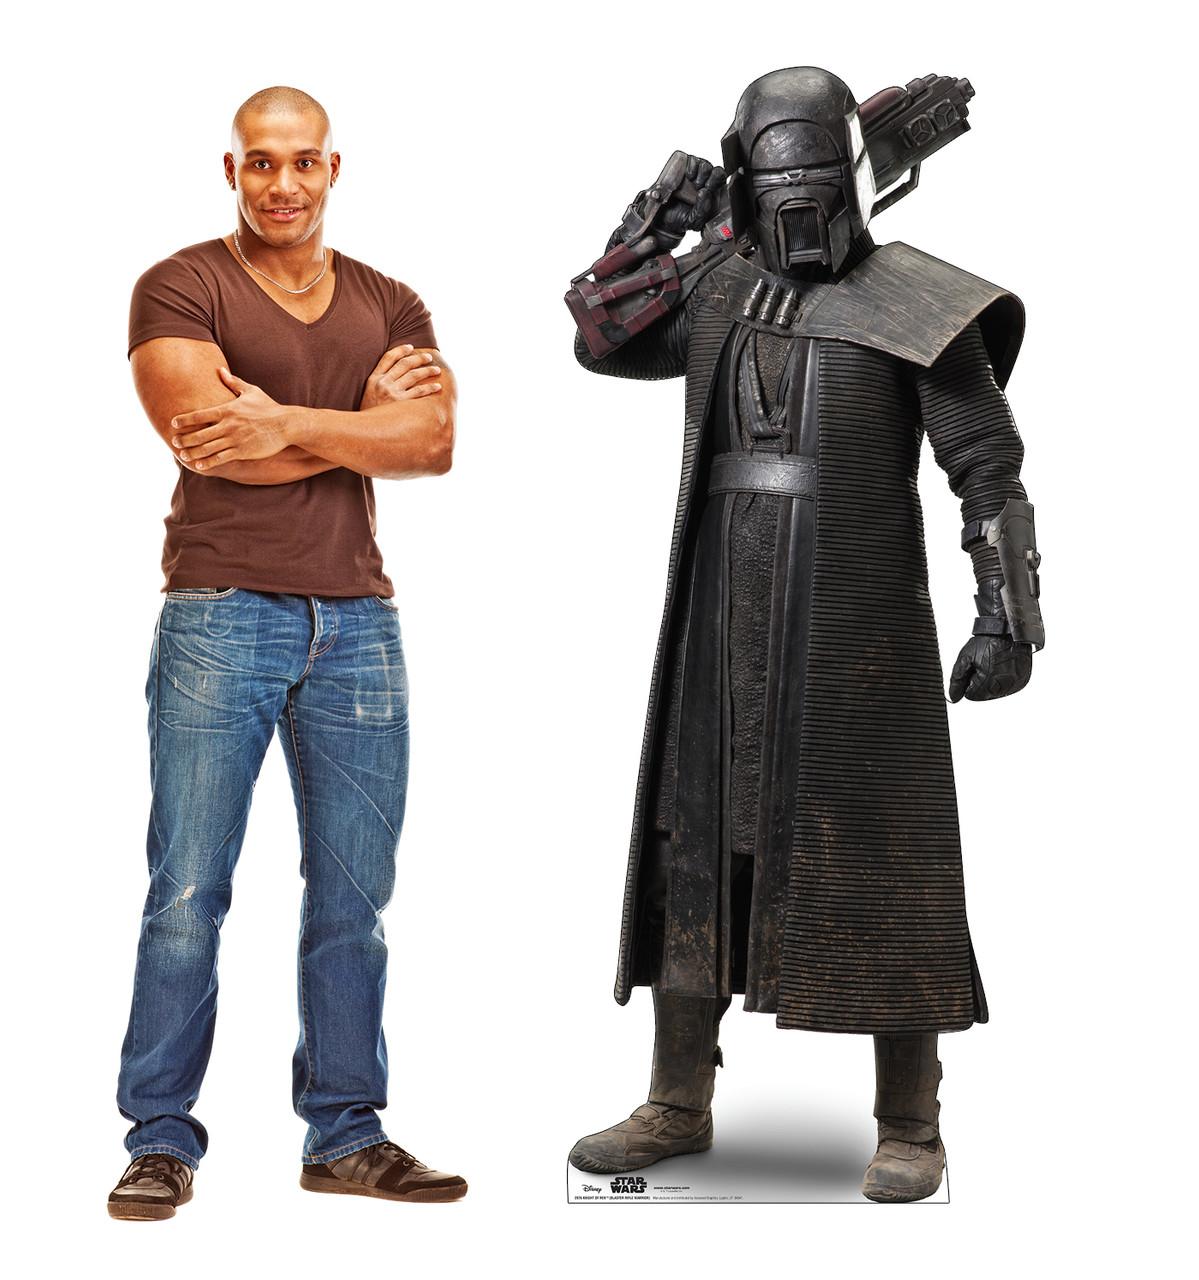 Life-size cardboard standee of Knight of Ren Blaster Rifle Warrior™ (Star Wars IX) with model.